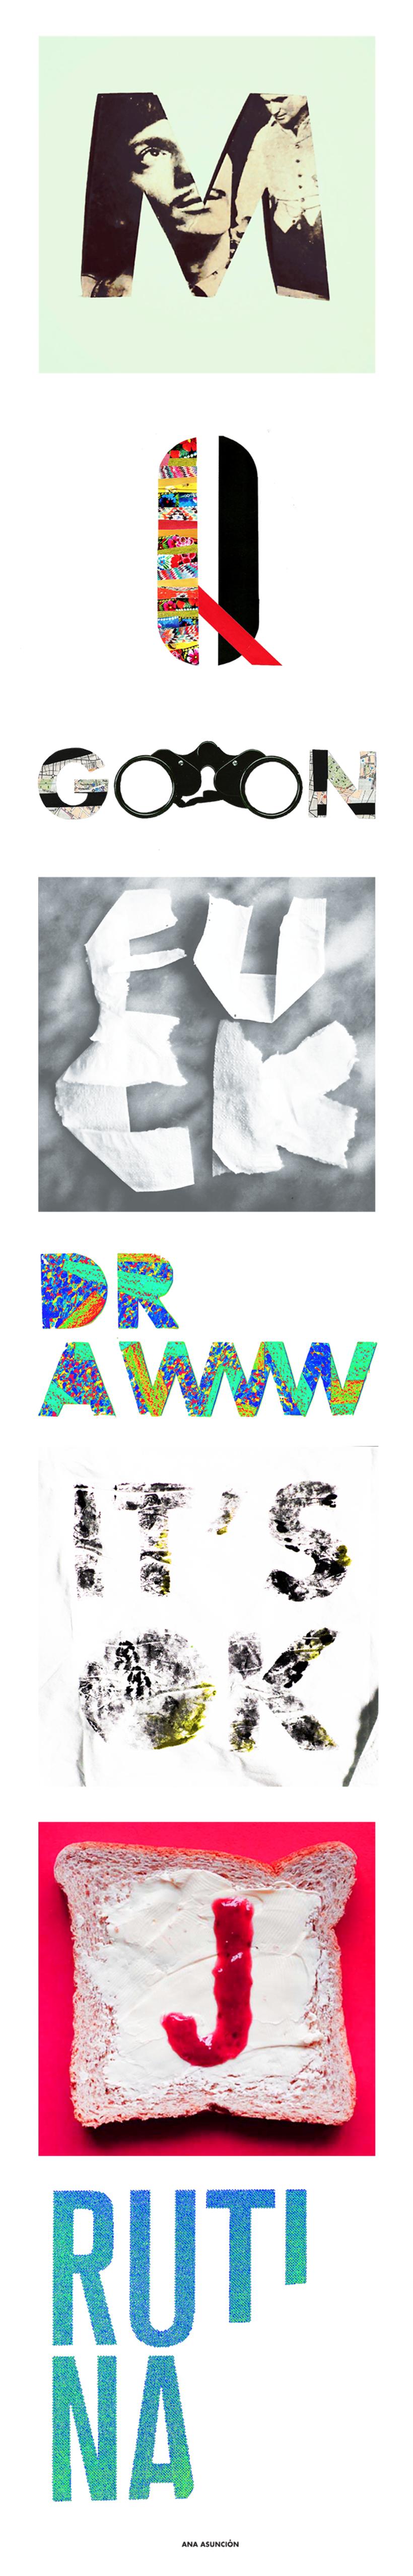 Letras dibujadas -1